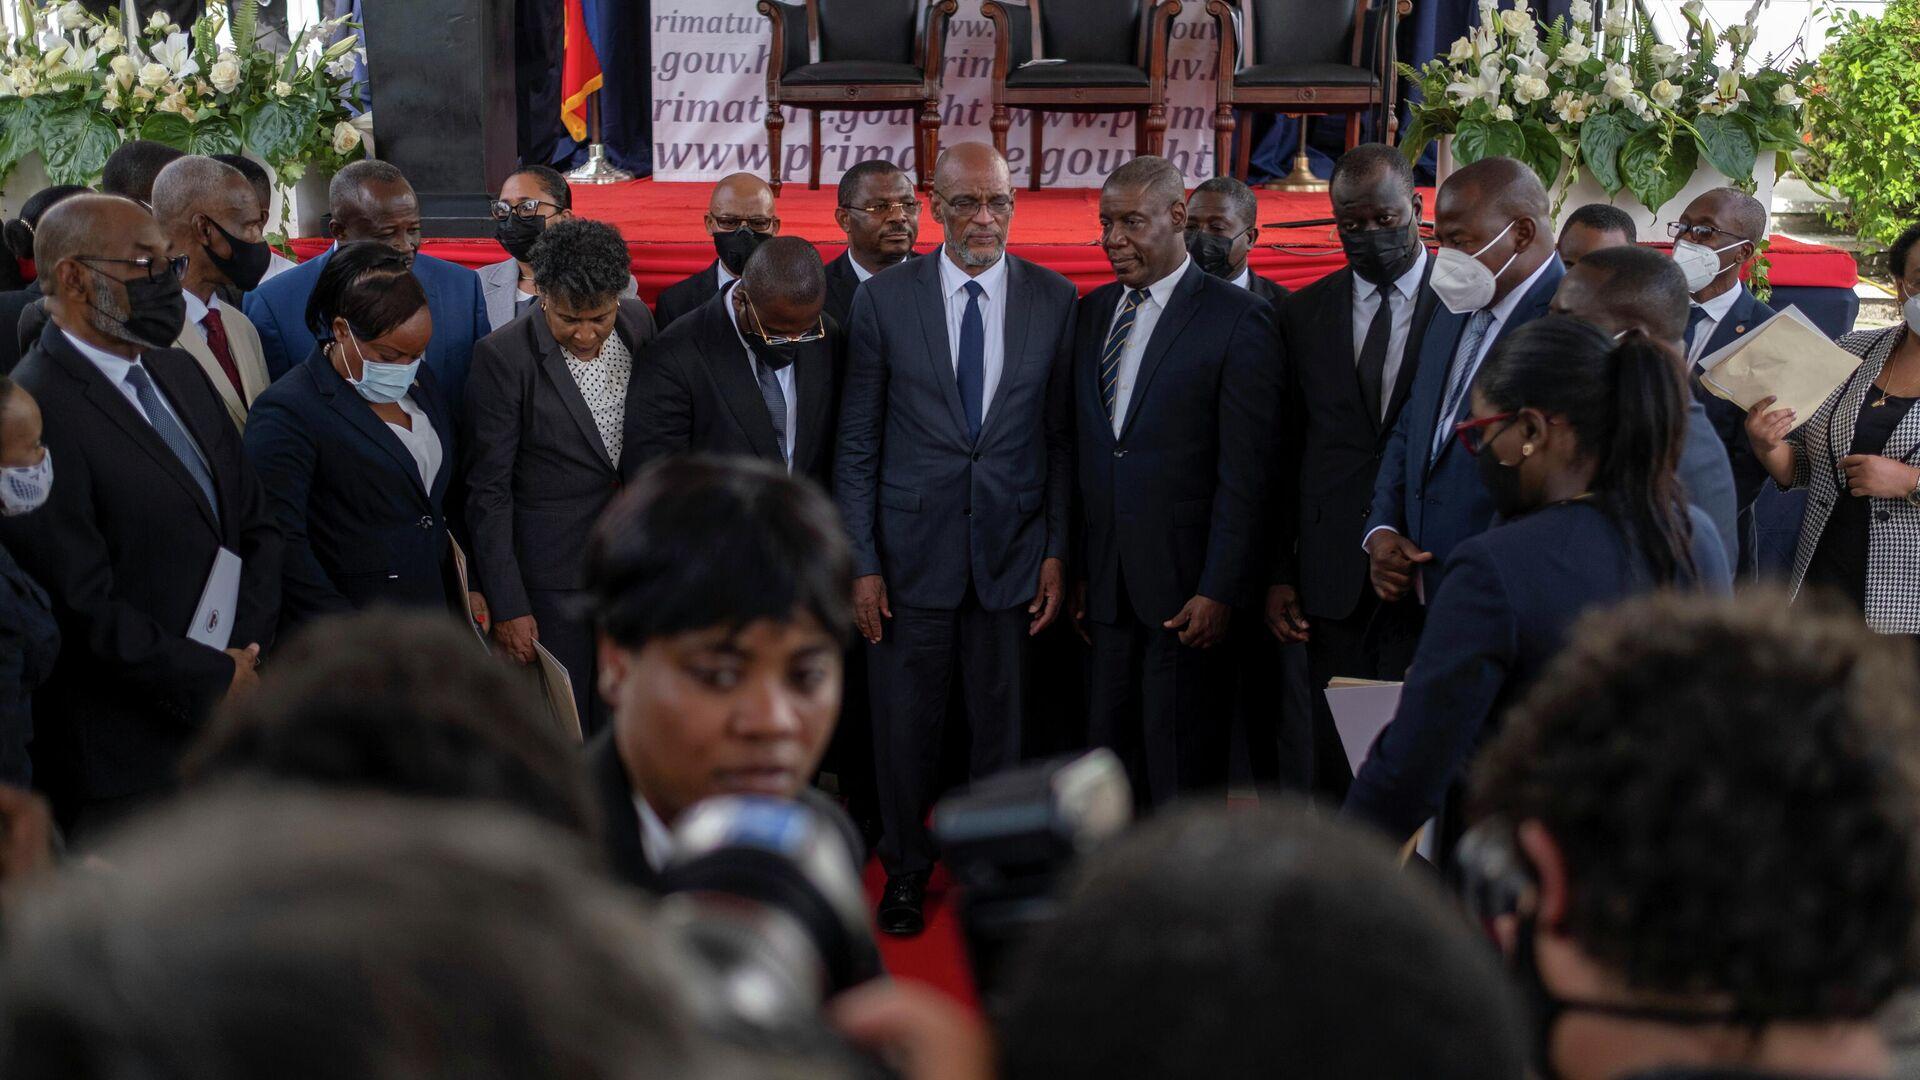 El primer ministro de Haití, Ariel Henry (centro) - Sputnik Mundo, 1920, 21.07.2021